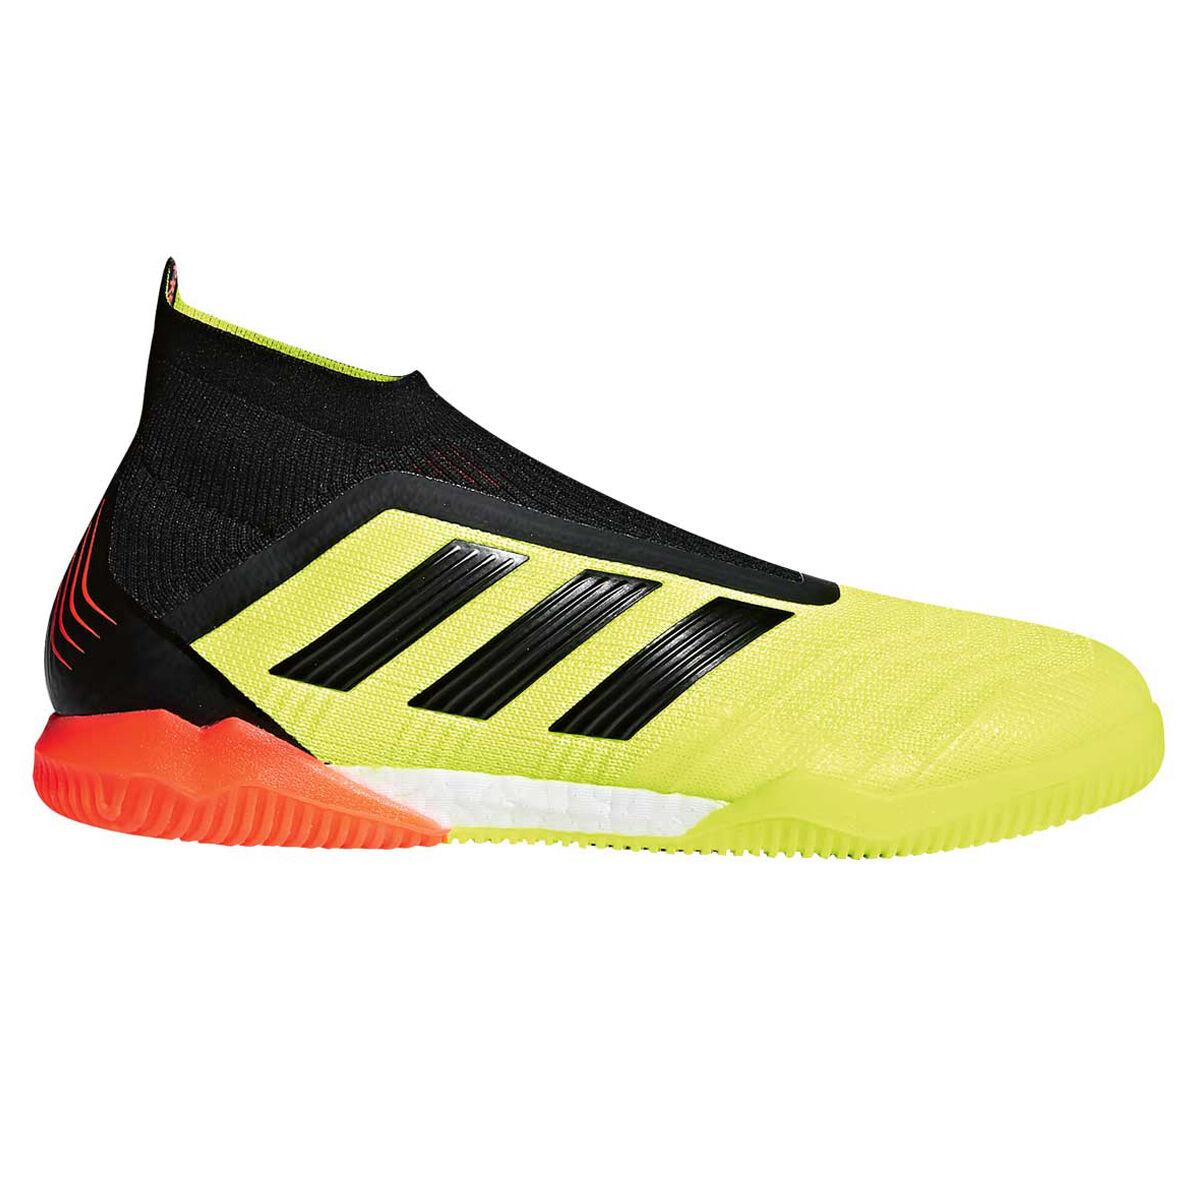 637de6a6a3d ... canada adidas predator tango 18 mens indoor soccer shoes lime black us  8 lime 65381 a80a4